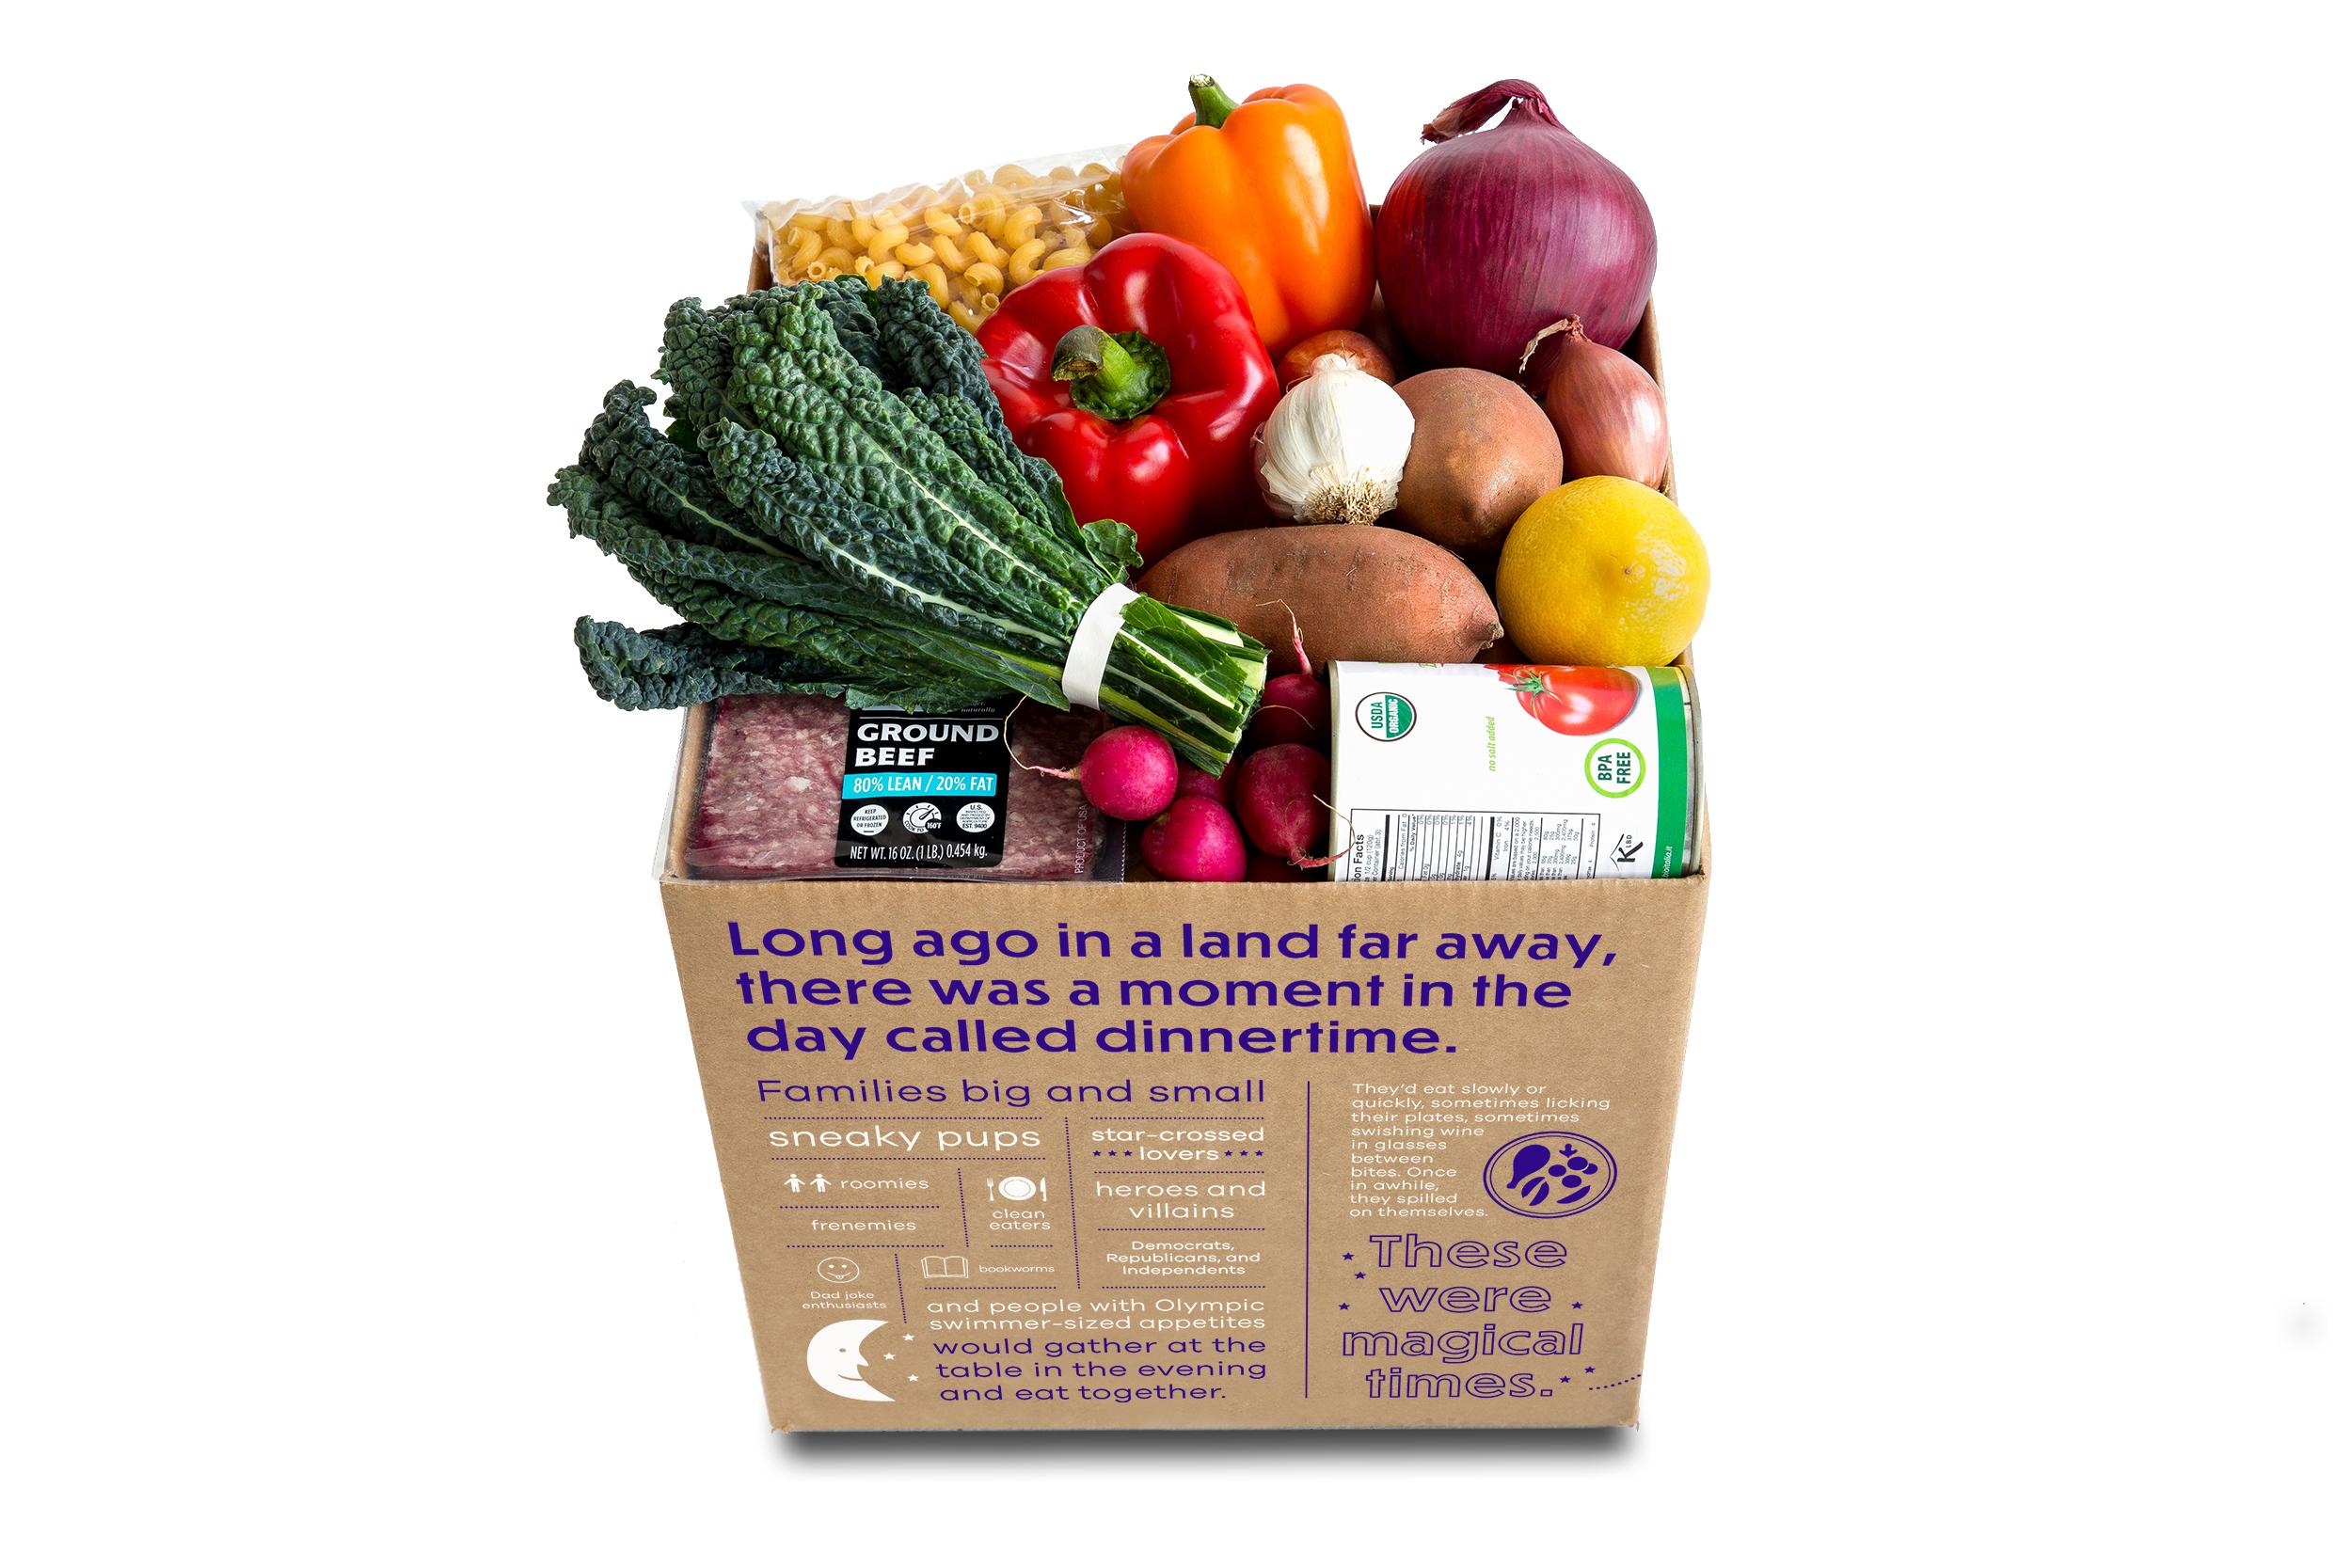 171120-101-ways-meal-kits-dinnerly